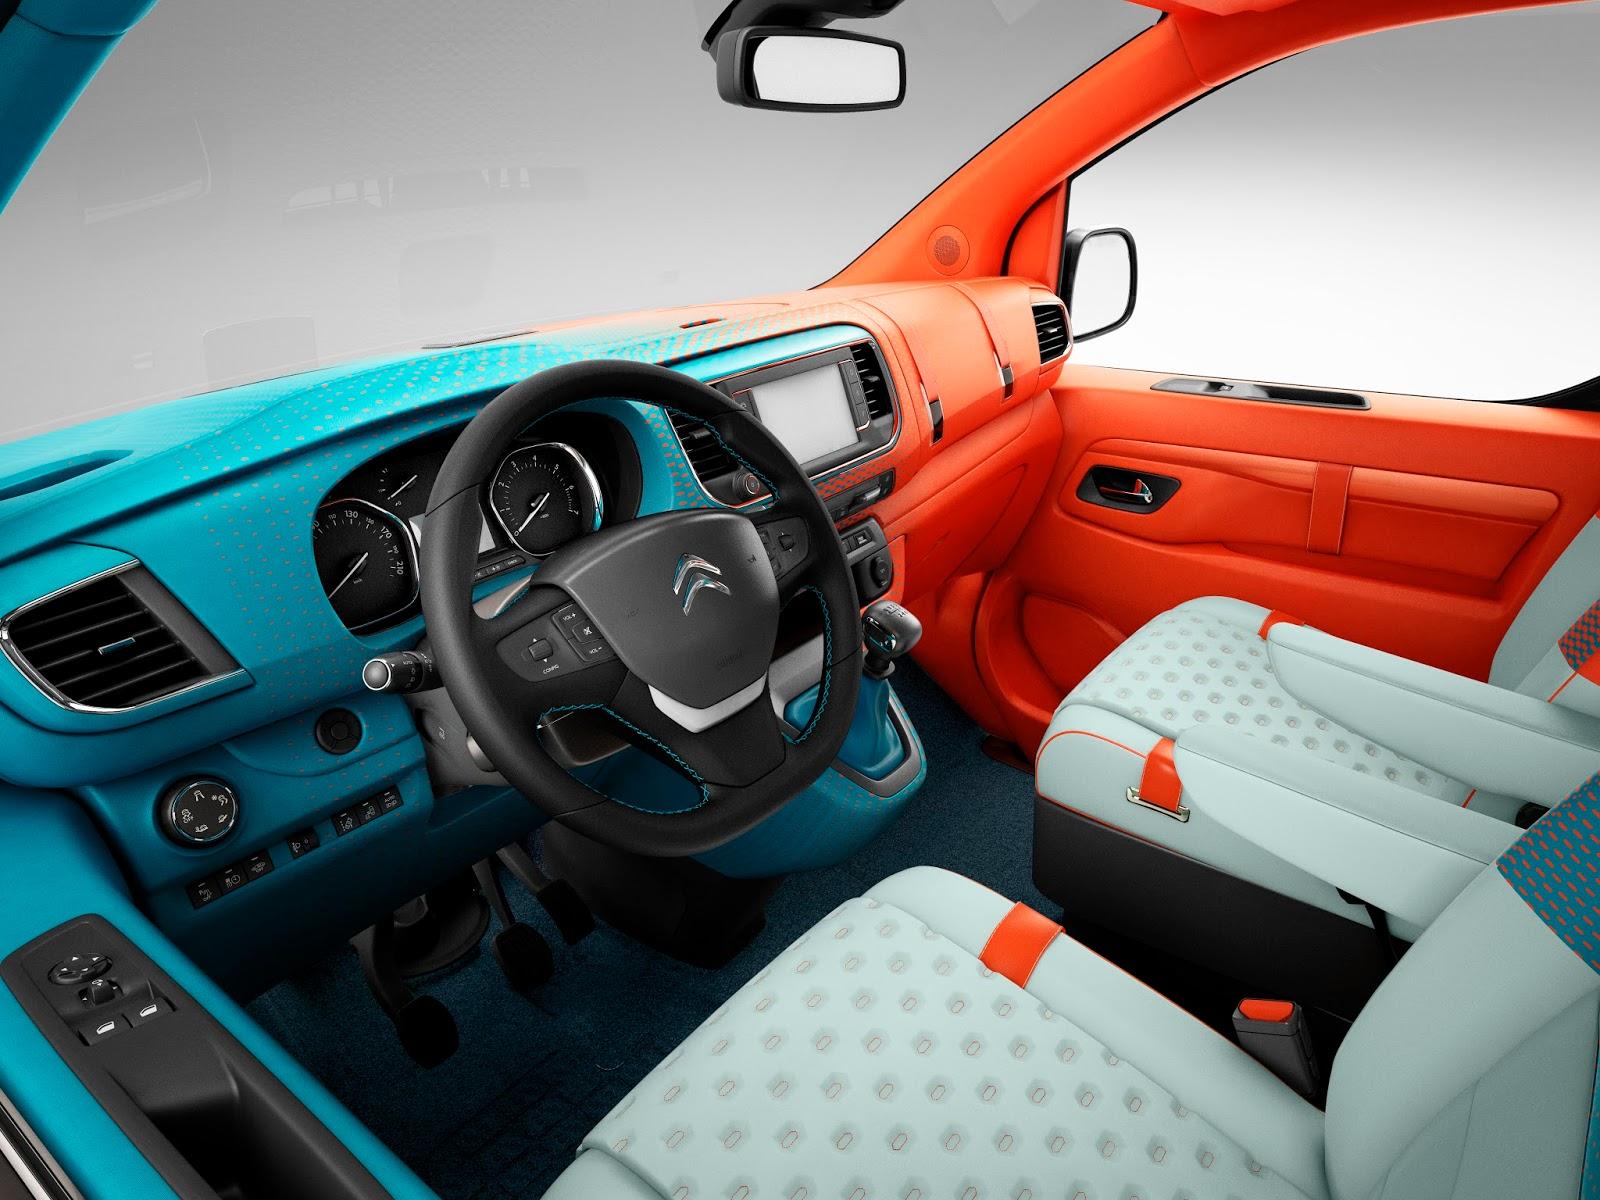 CL%2B16.020.006 Με 5 Παγκόσμιες Πρεμιέρες η Citroën Στο Σαλόνι Αυτοκινήτου της Γενεύης